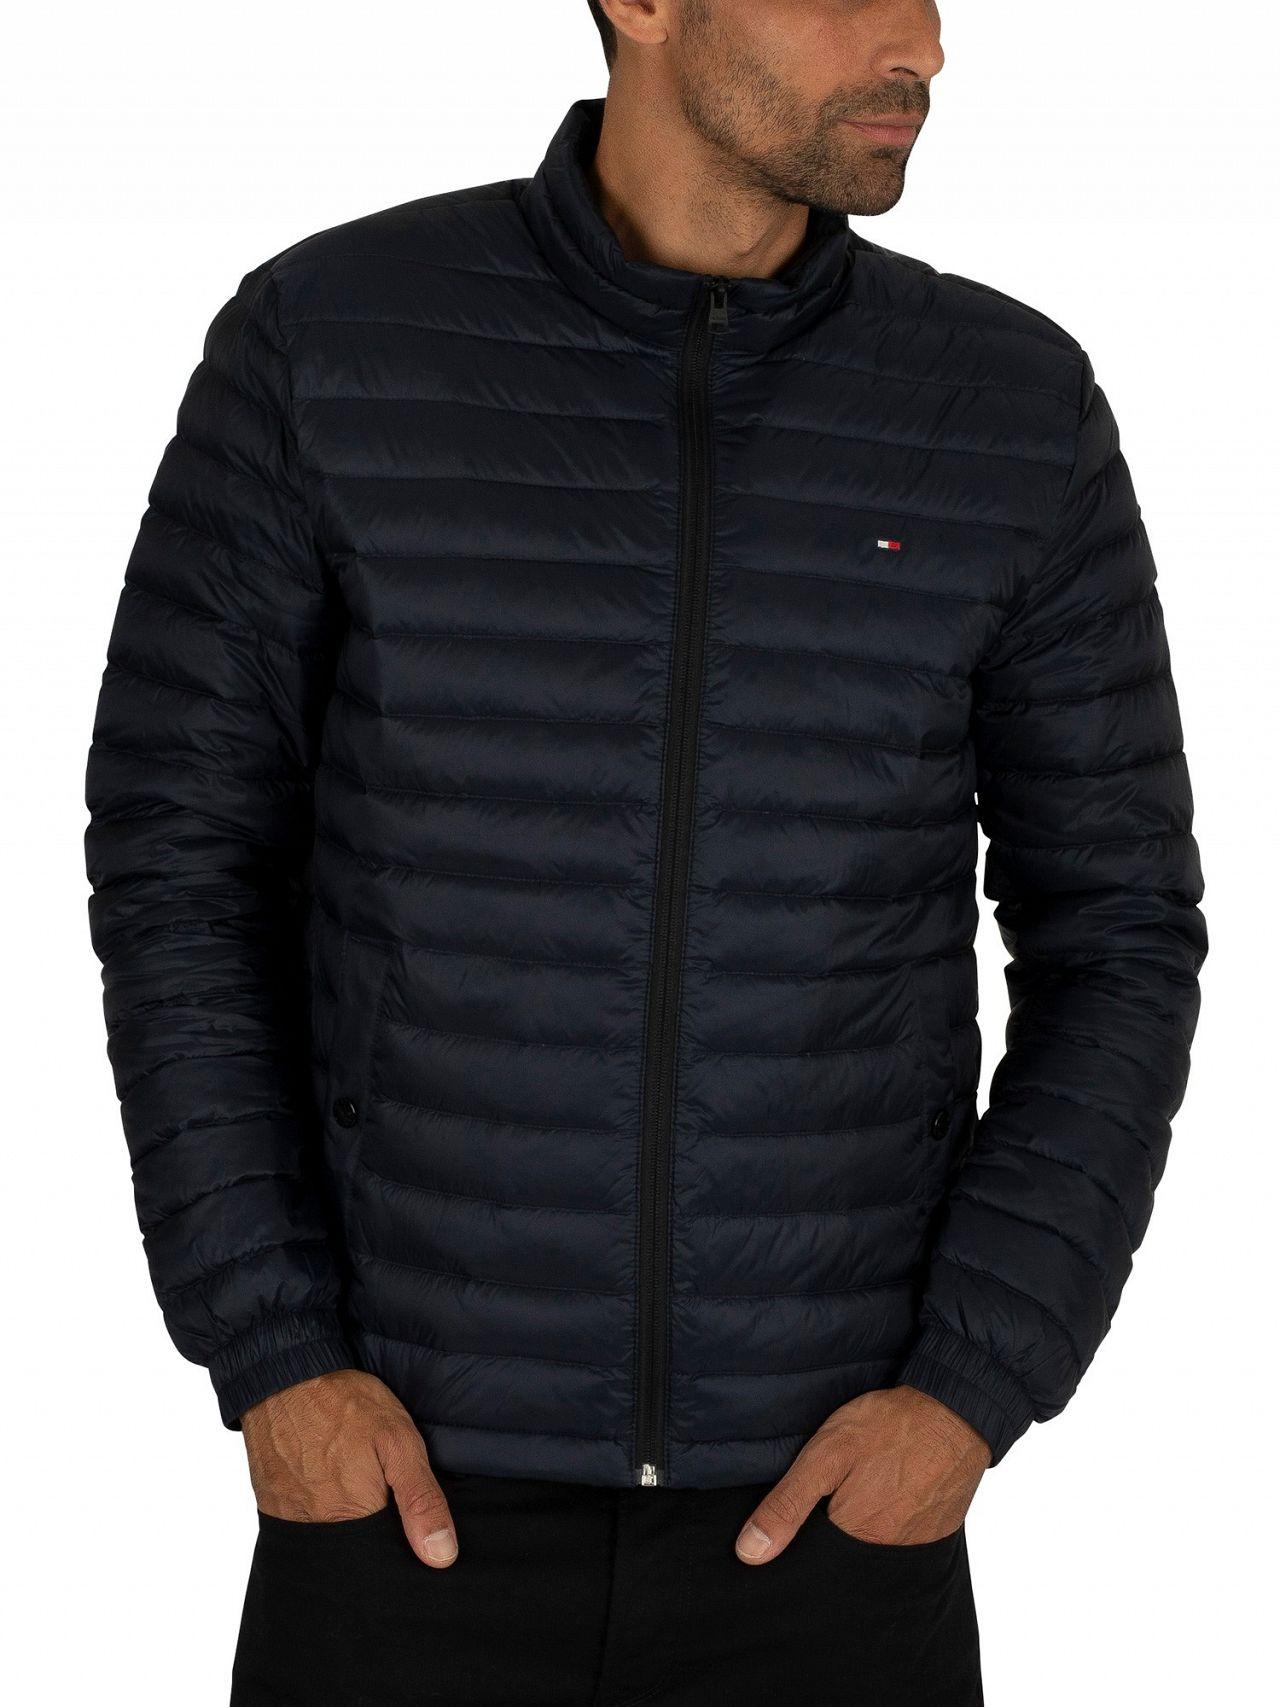 Tommy Hilfiger Sky Captain Core Lightweight Packable Down Jacket ... 48c239289